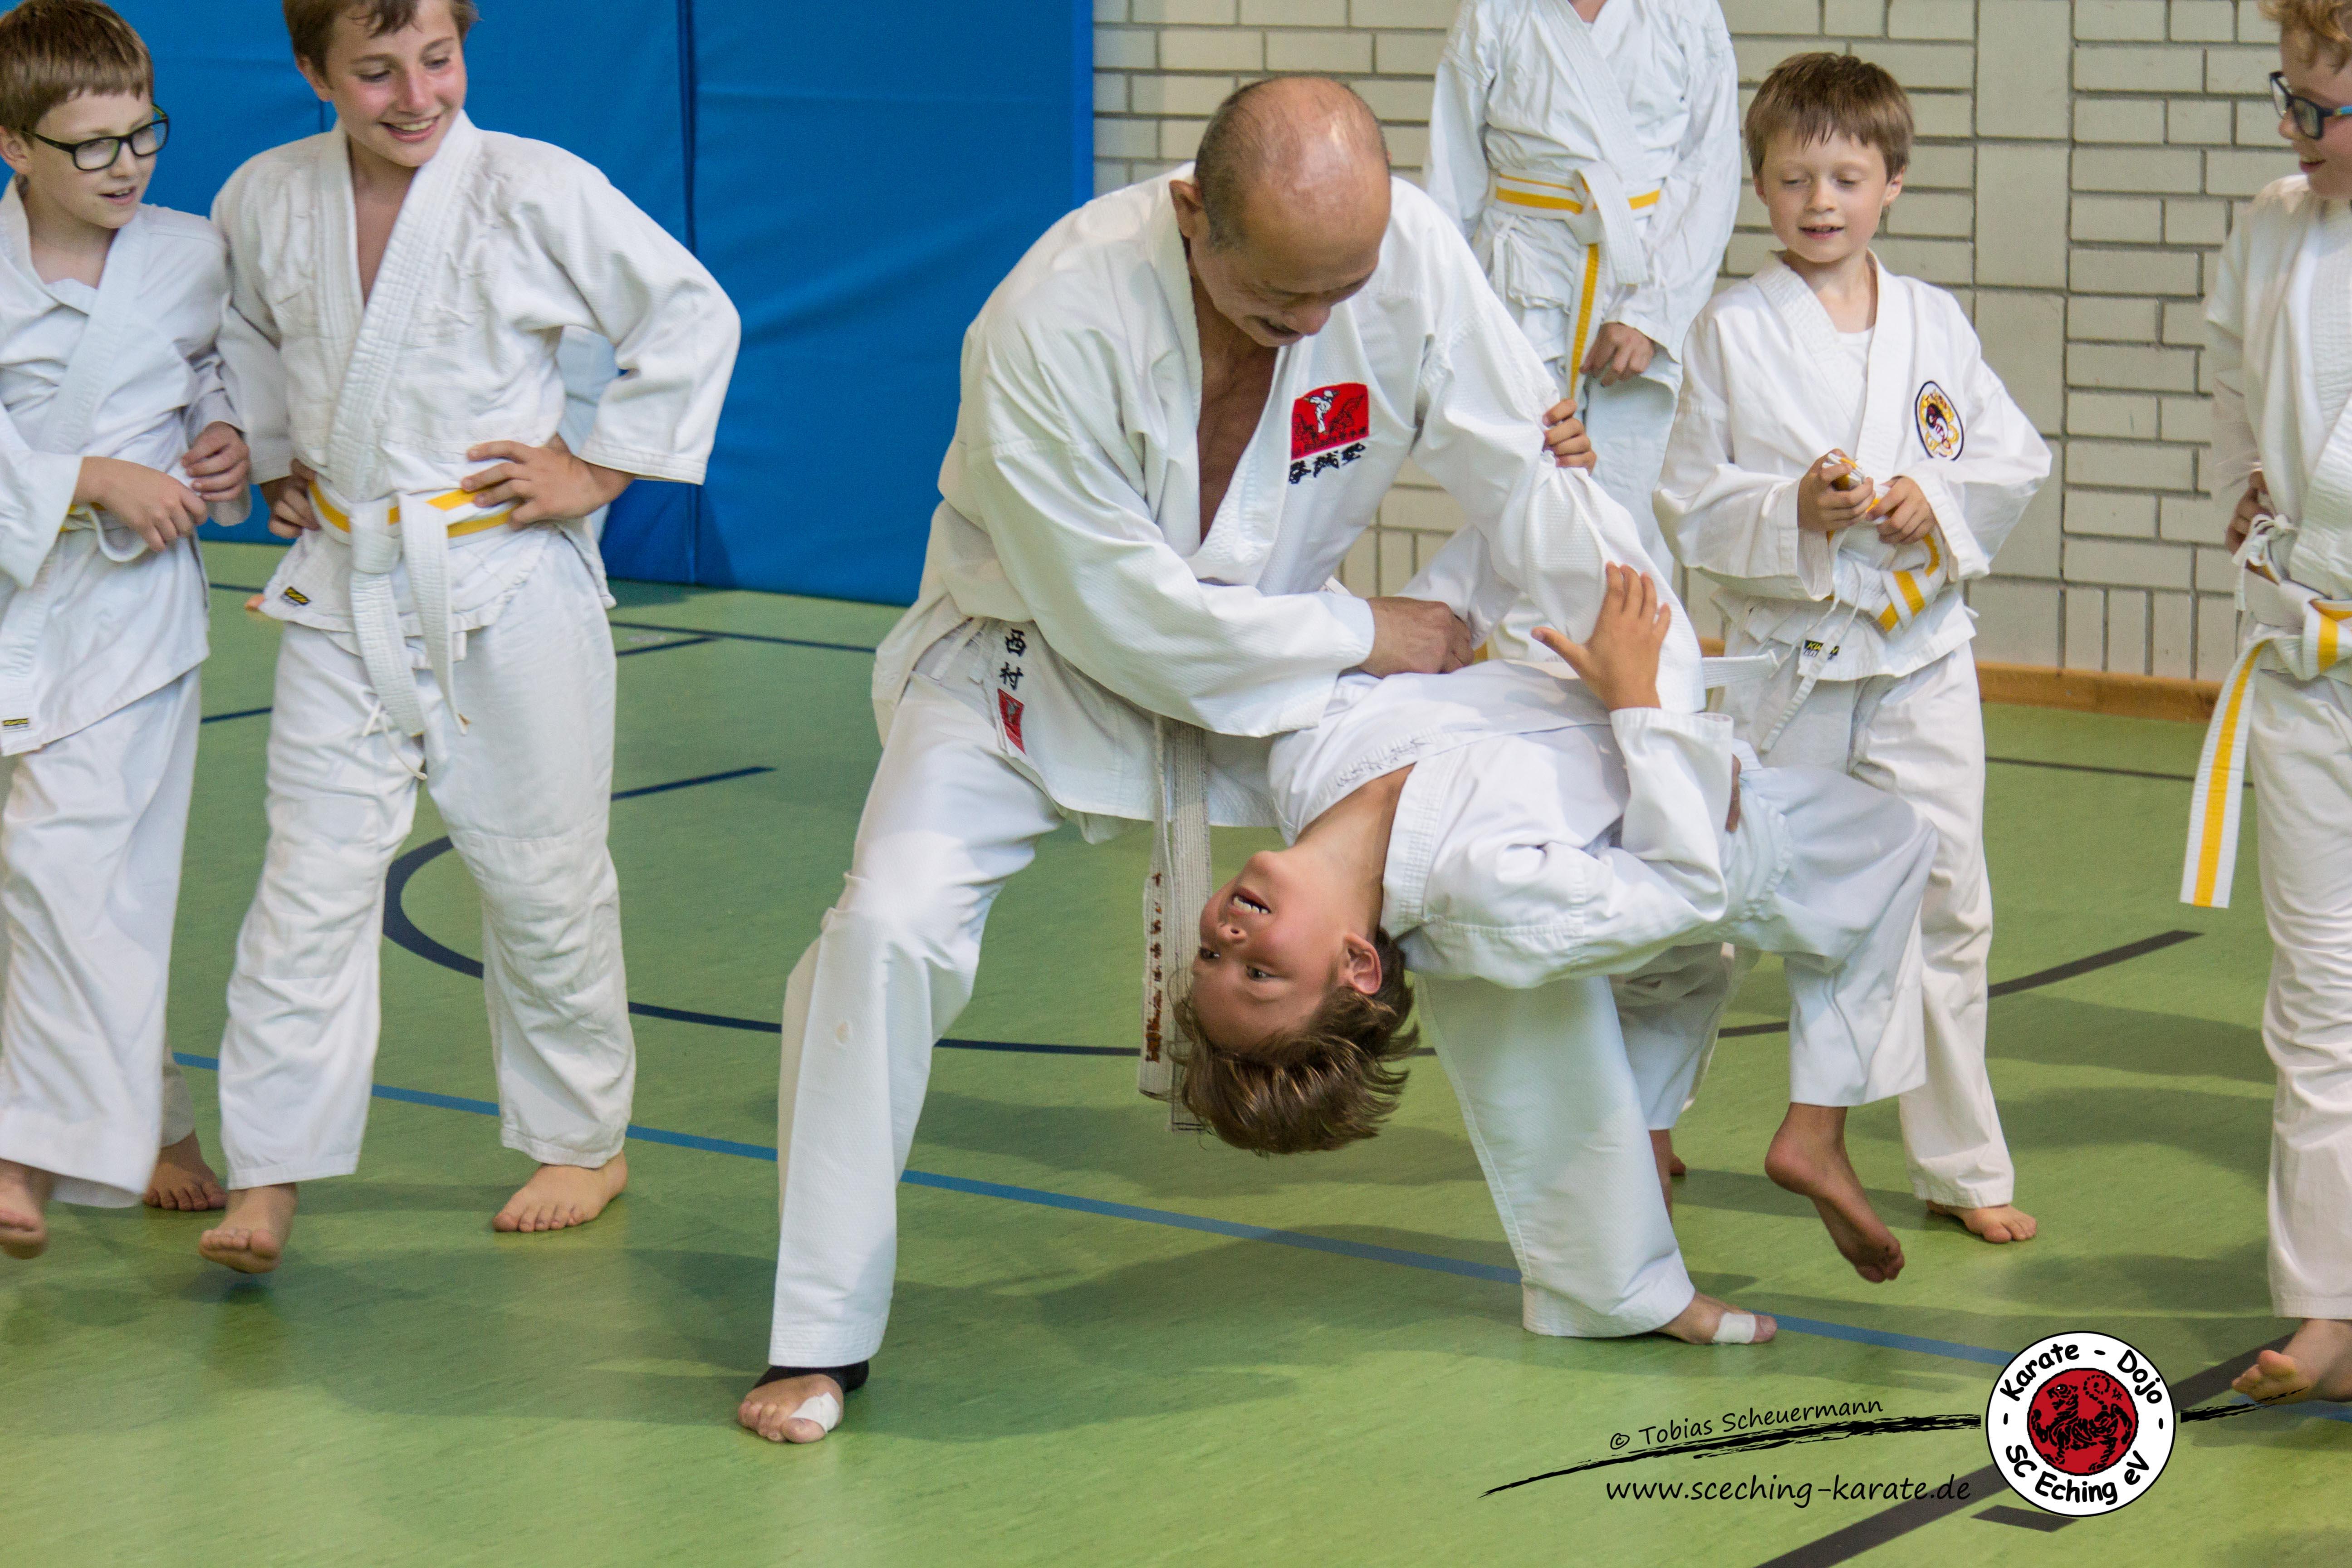 Shotokan Karate Dojo Eching